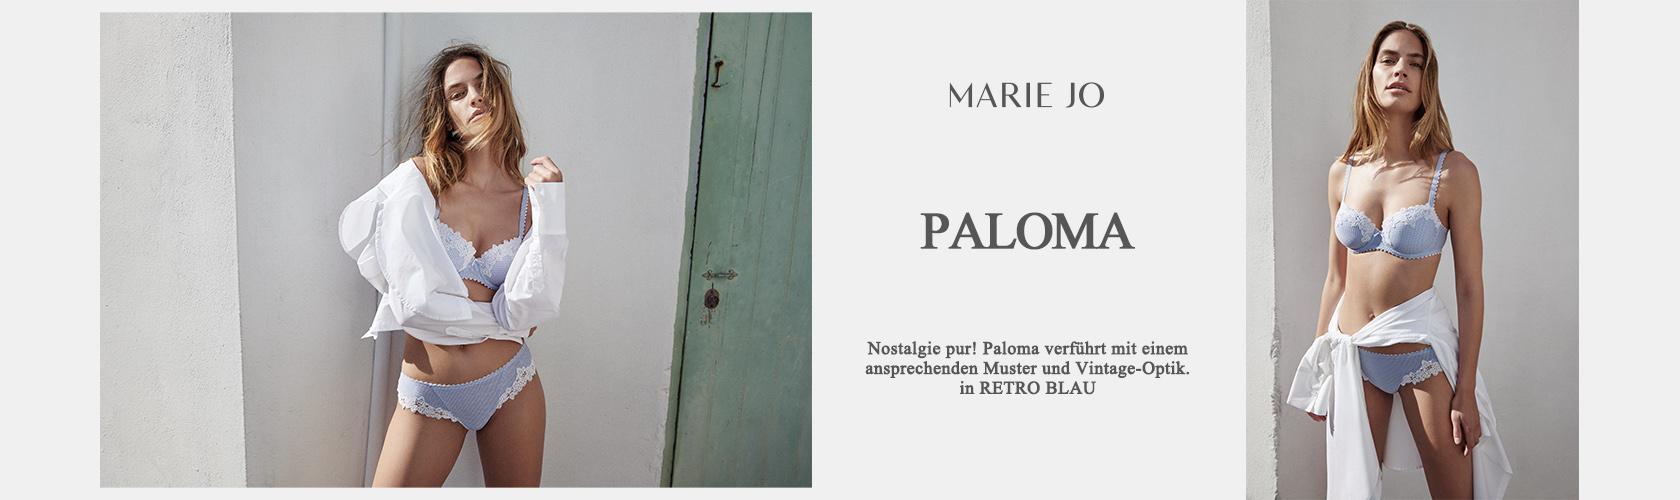 2020000984 Slideshow PALOMA BRT 26.06.20